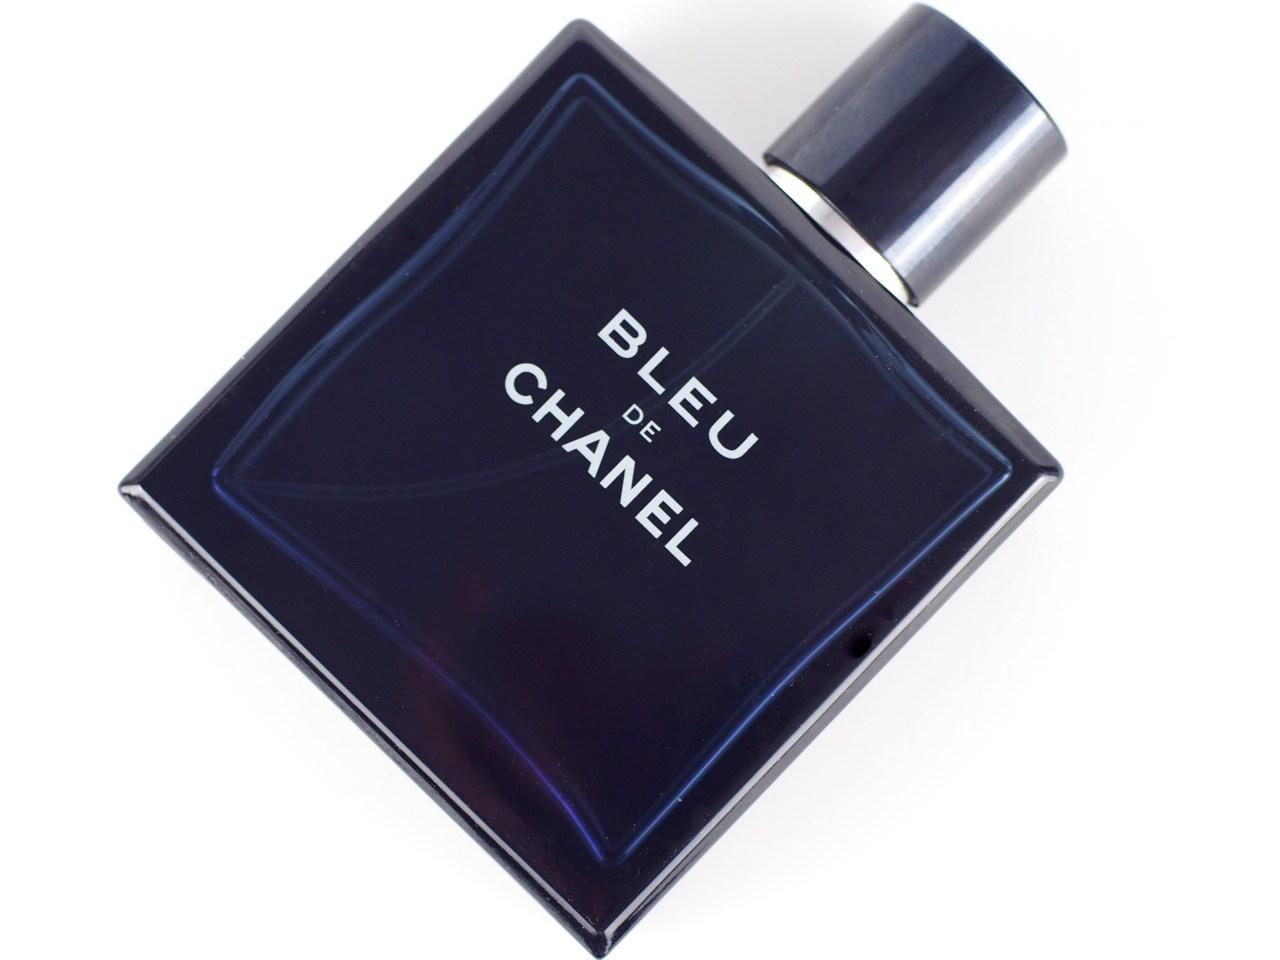 Bleu de Chanel Bottle